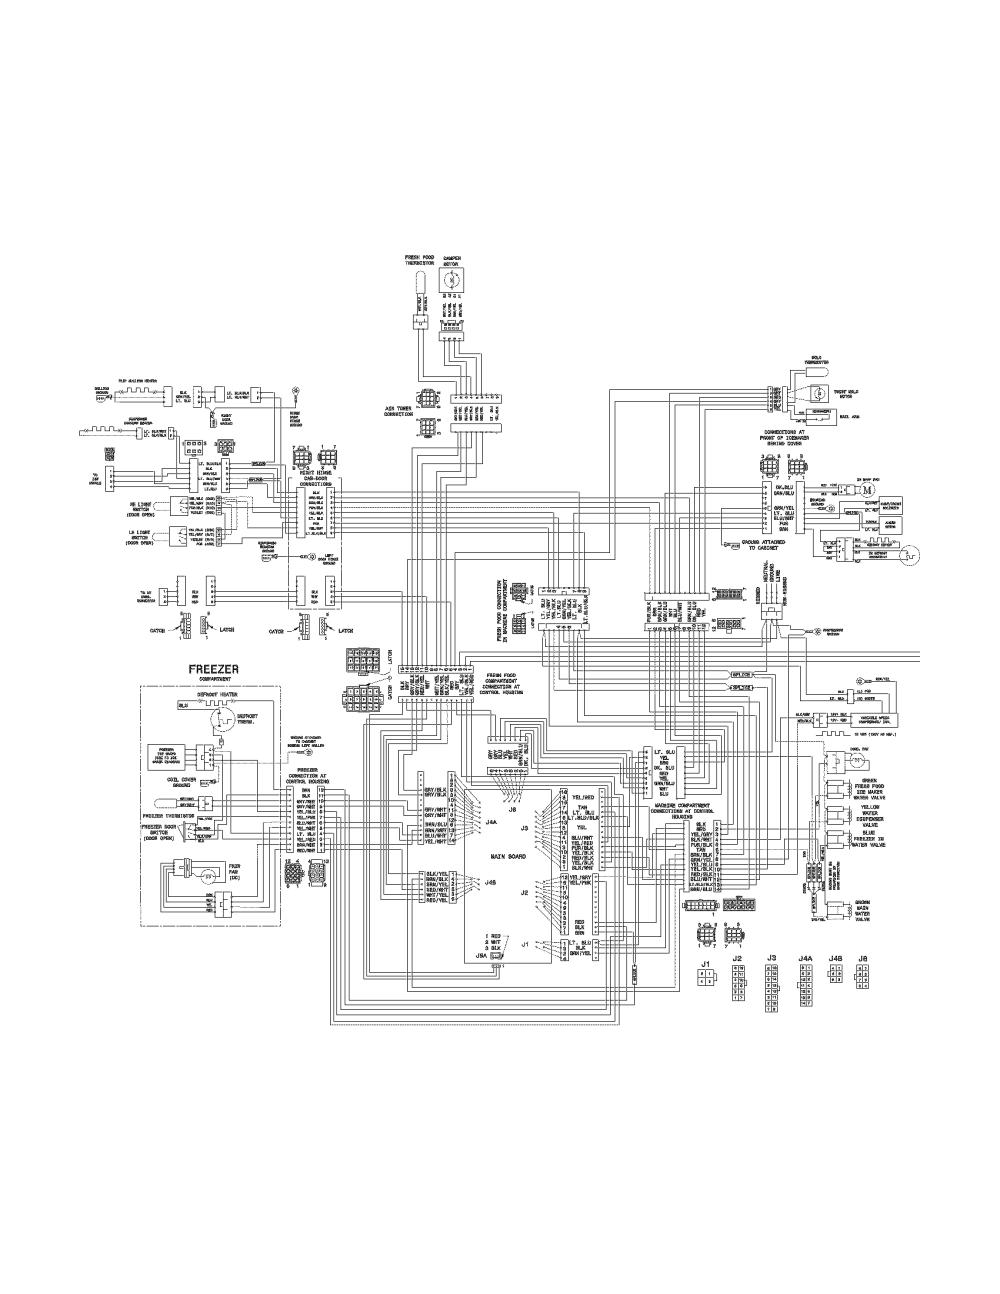 medium resolution of frigidaire model fphb2899pf3 bottom mount refrigerator genuine parts samsung refrigerator wiring schematic frigidaire refrigerator wiring schematic